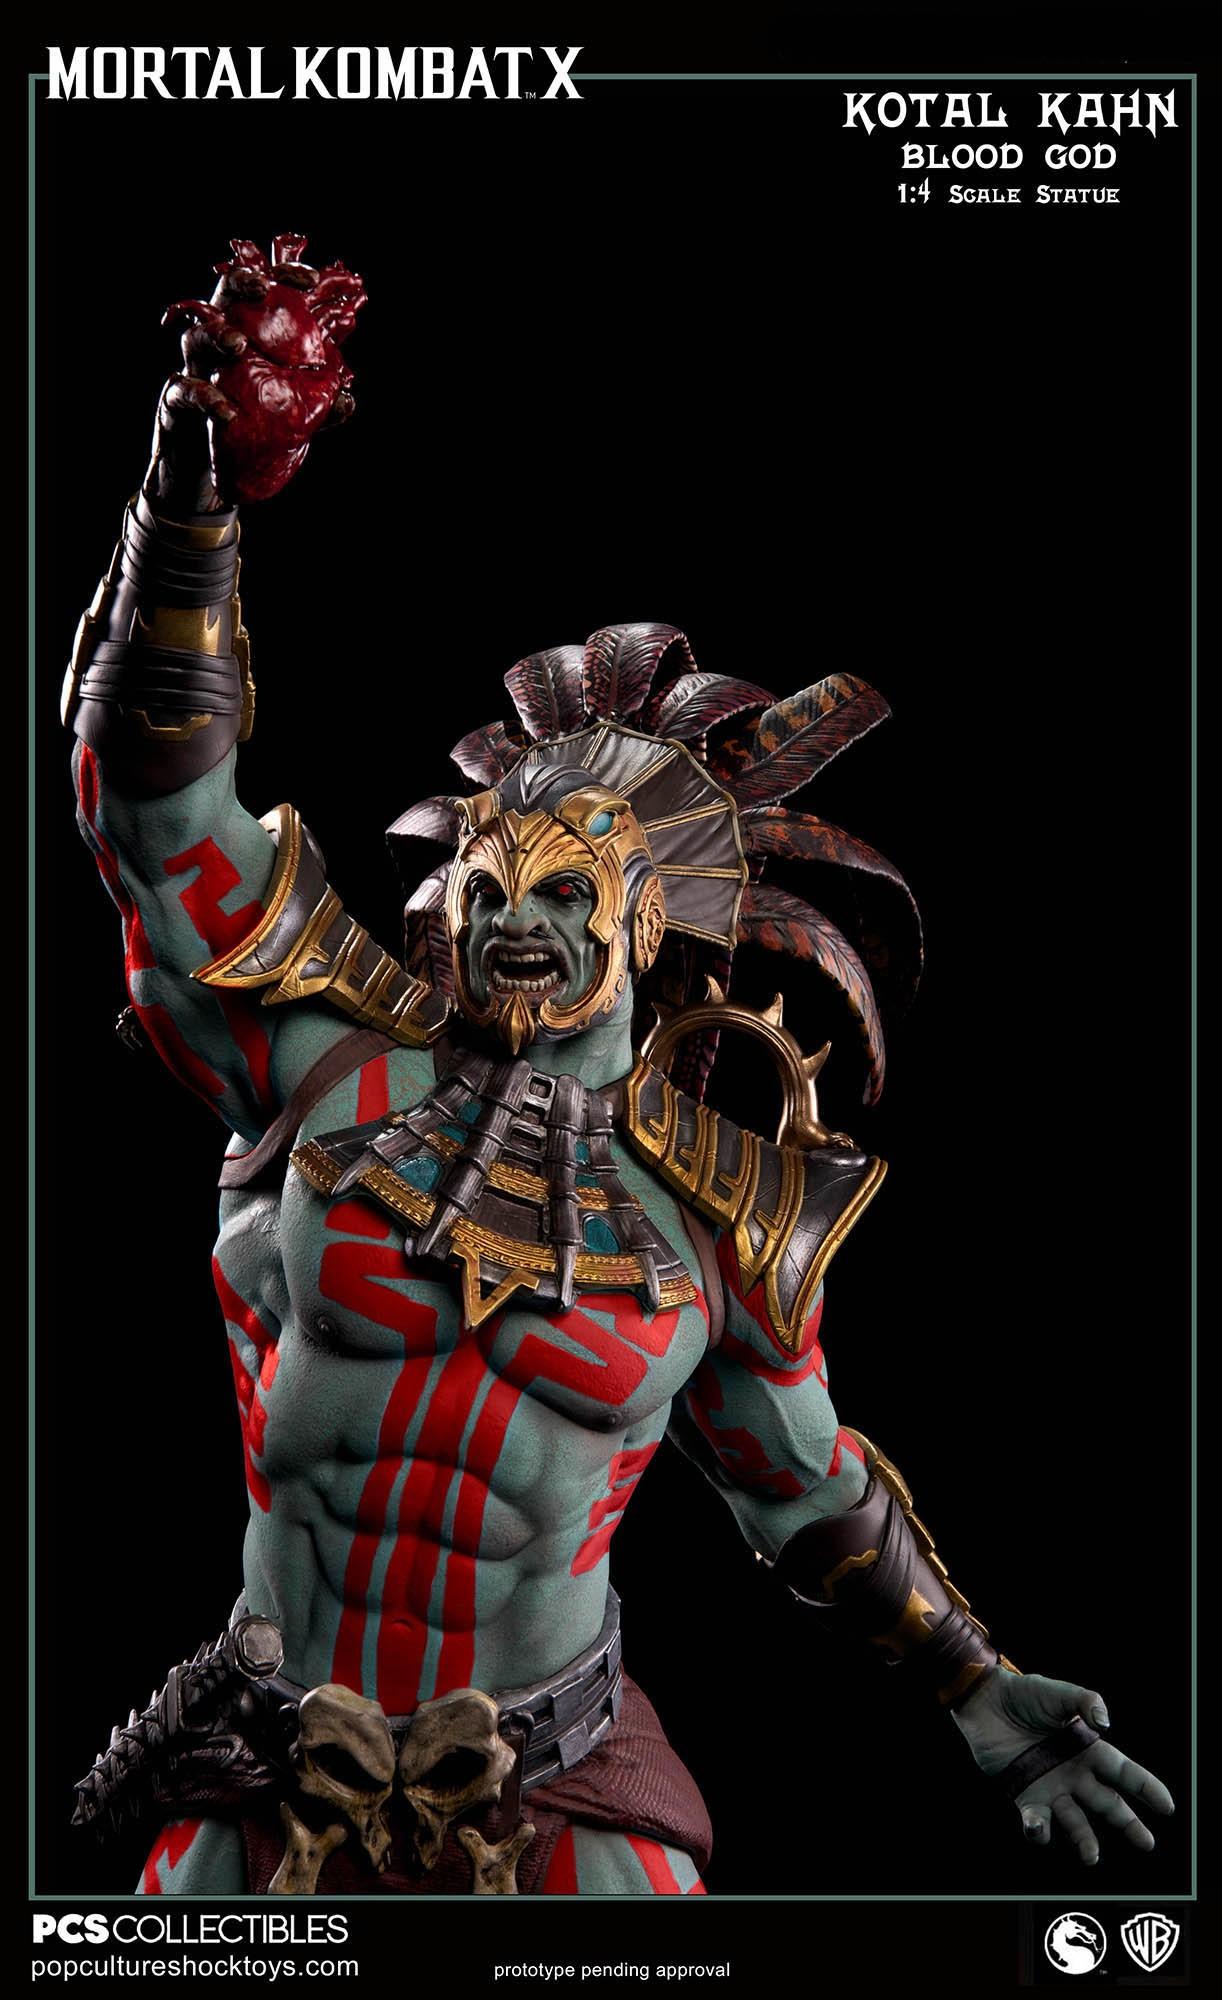 [Pop Culture Shock] Mortal Kombat X: Kotal Kahn 1:4 scale PCS-Kotal-Kahn-Blood-God-009